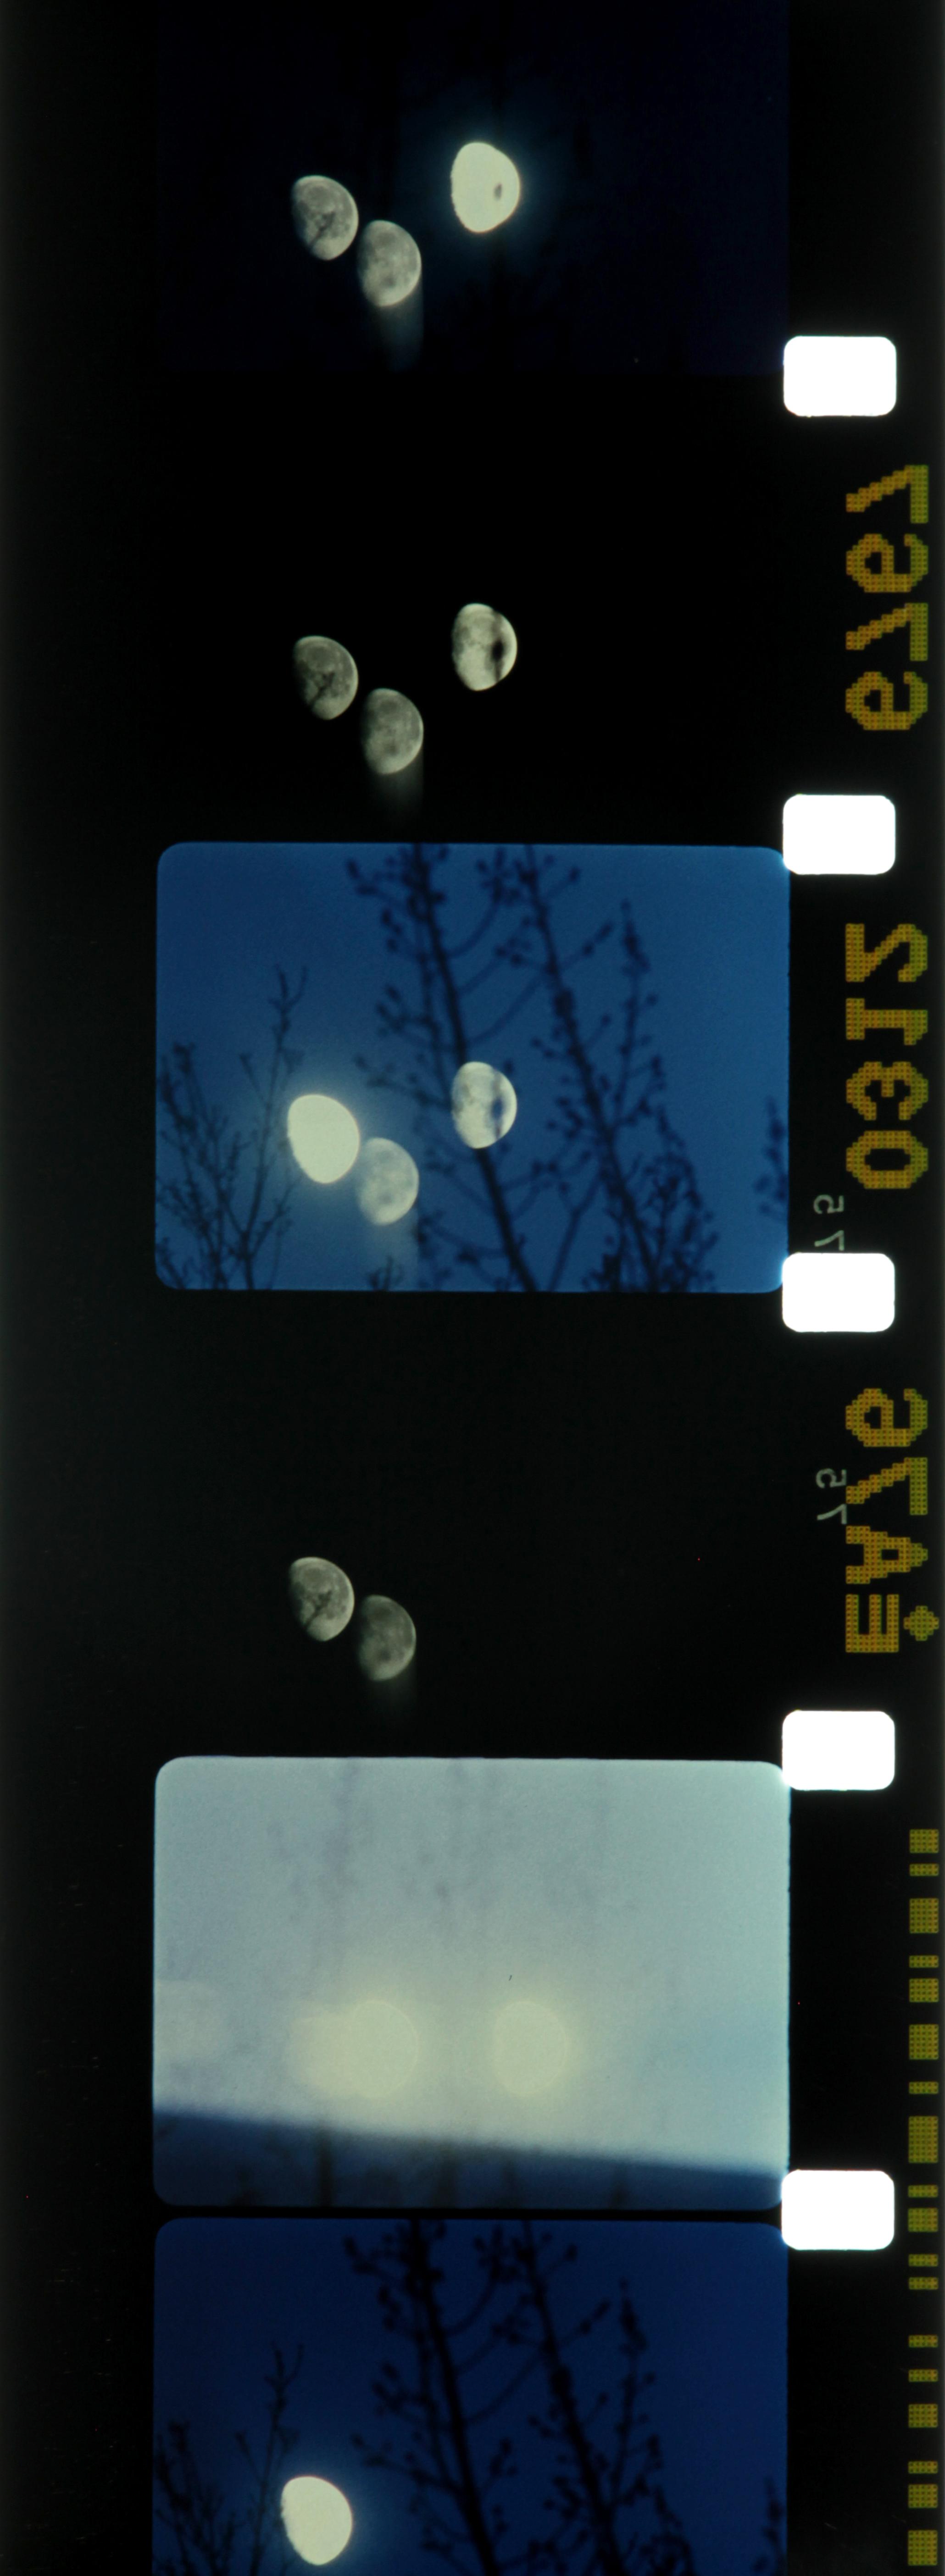 Lunar Almanac Malena Szlam 2013